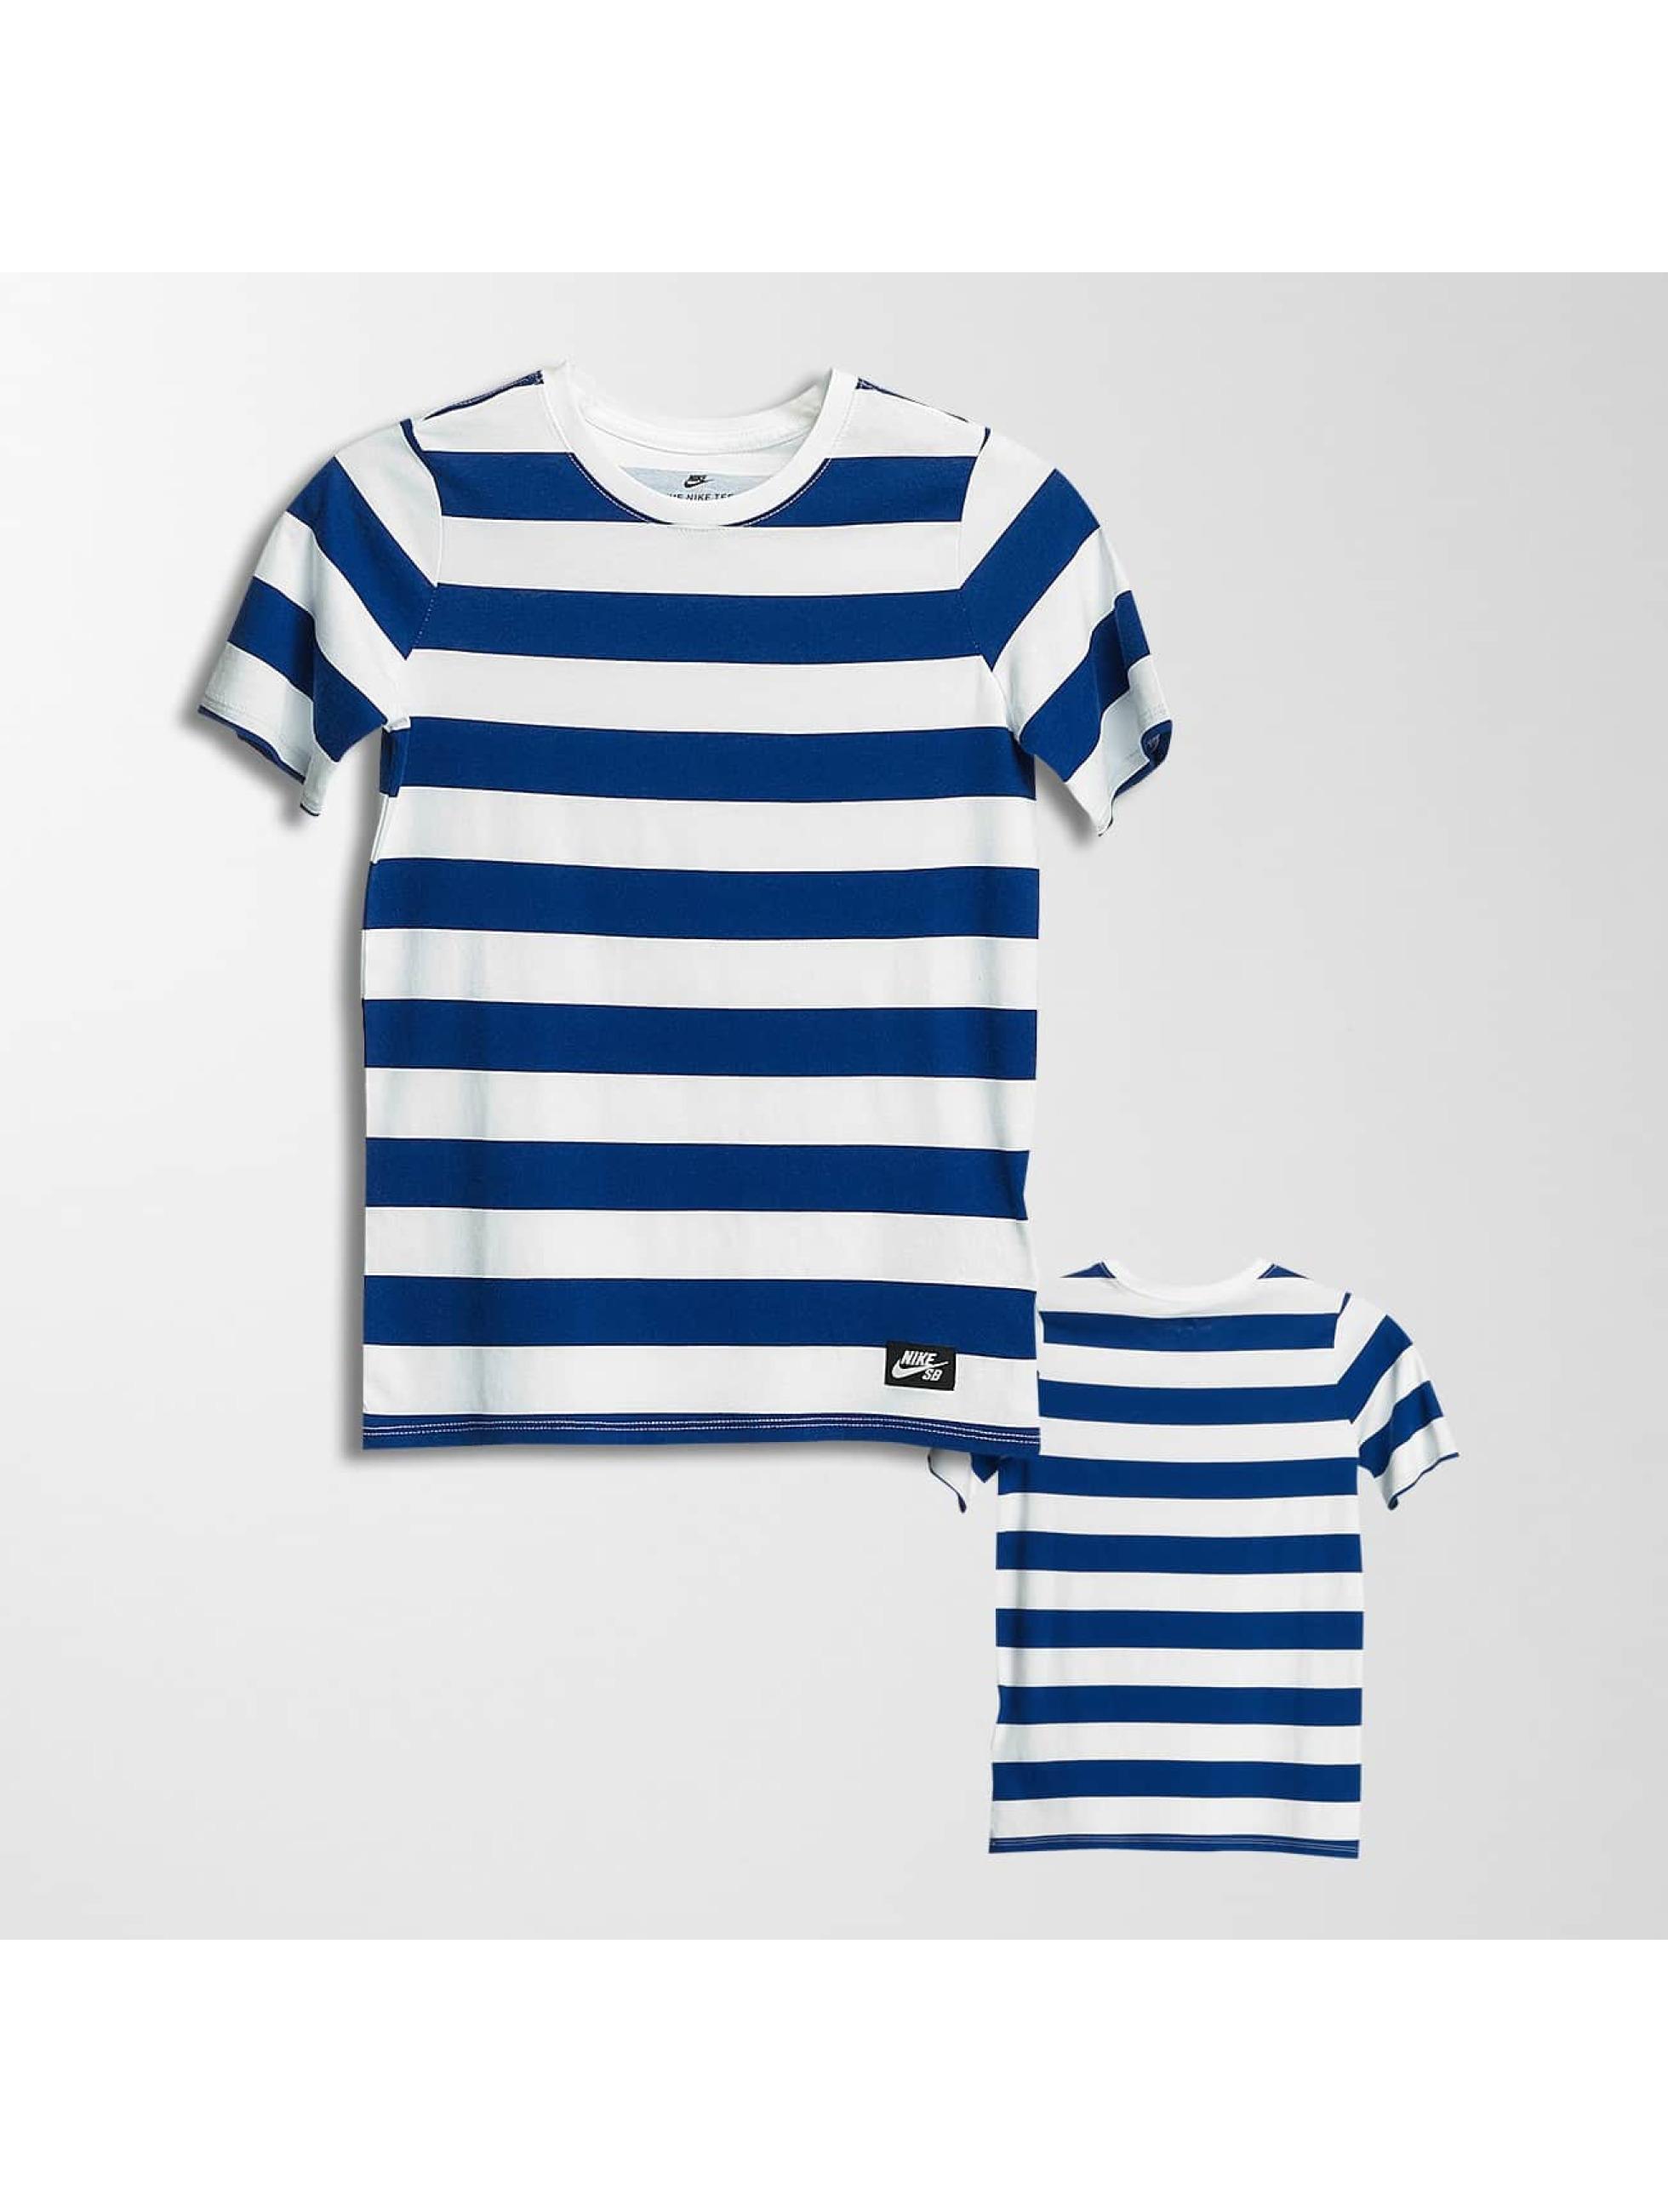 Nike SB T-shirt Boys bianco